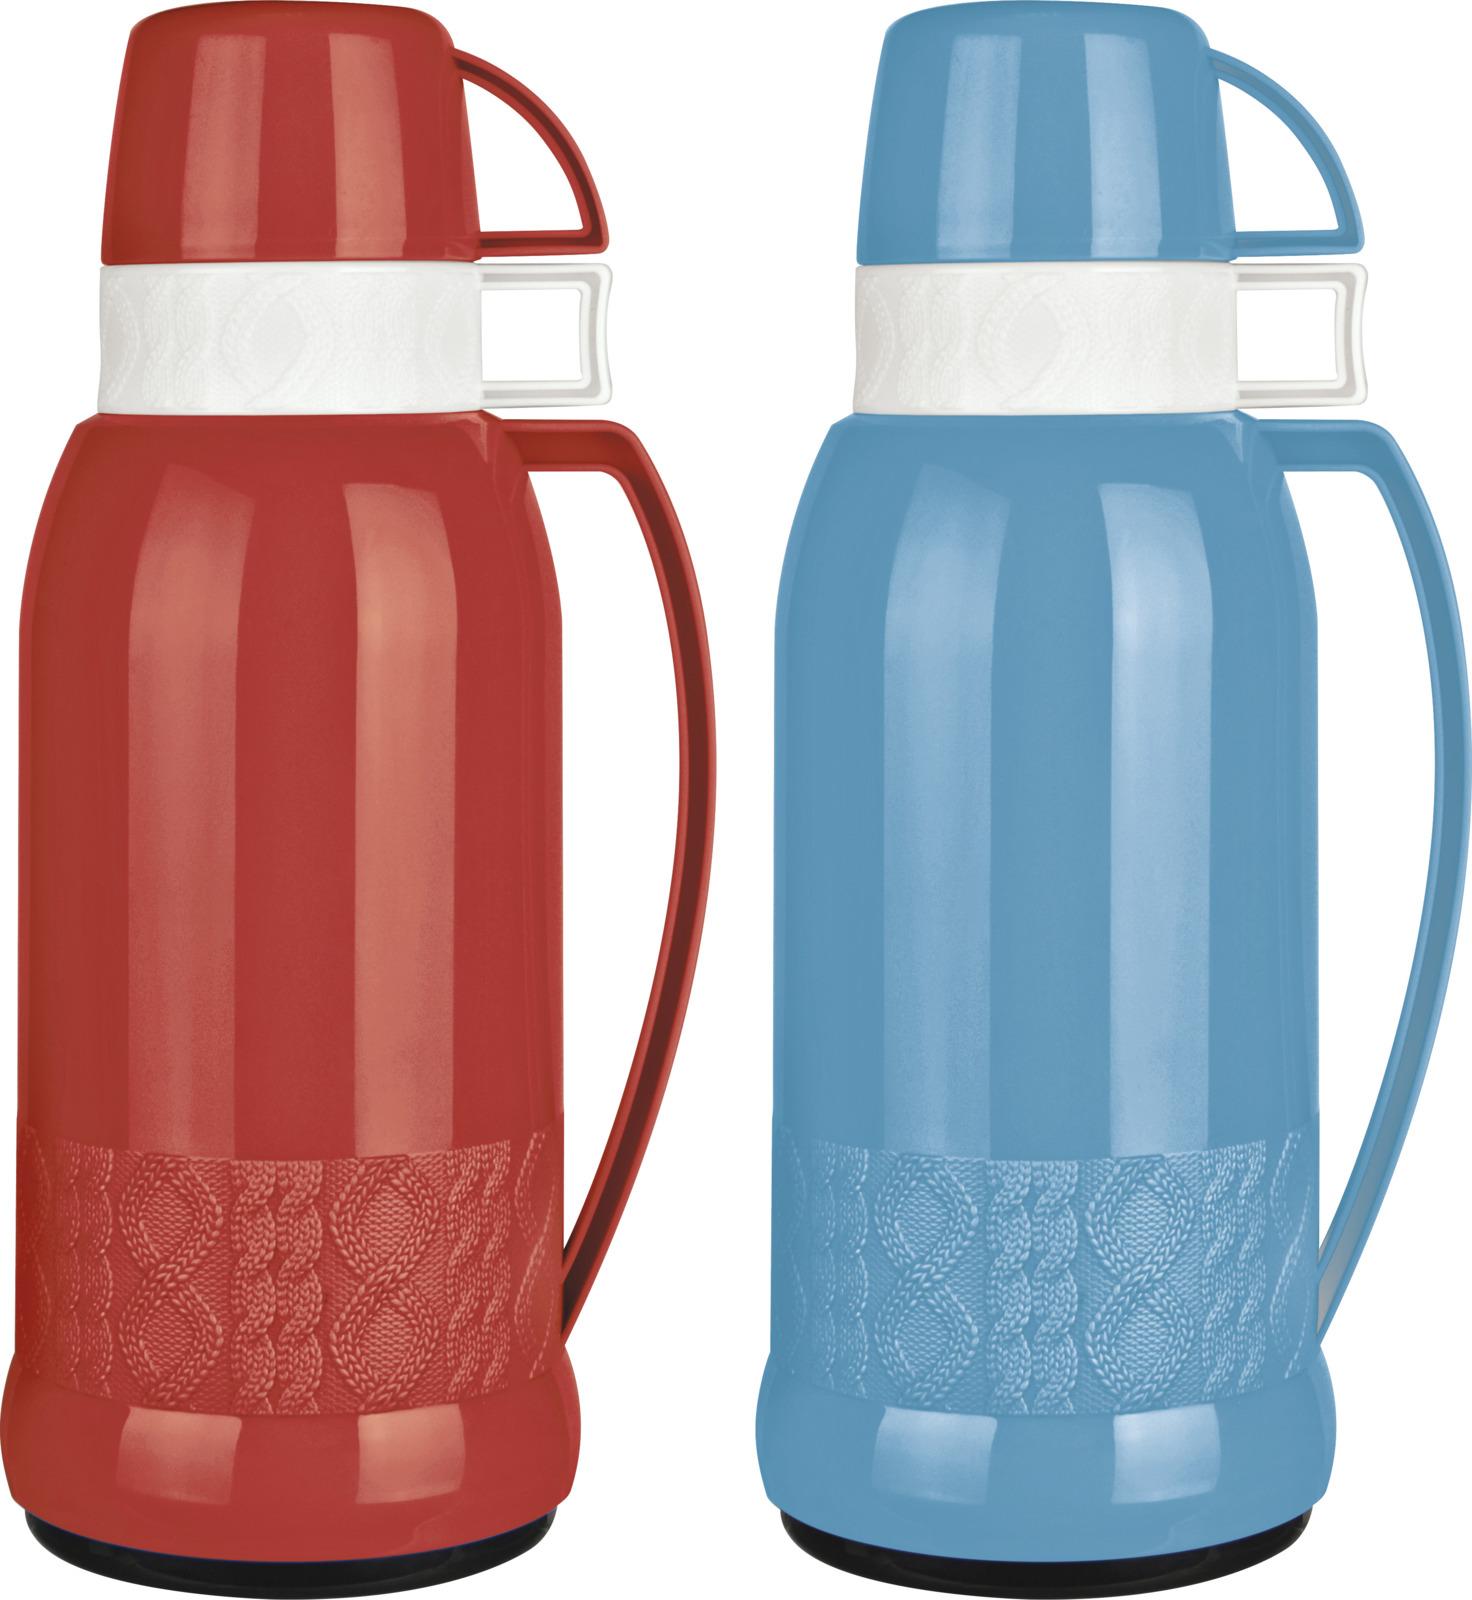 Термос Mallony Finezza, цвет: красный, синий, 1,8 л